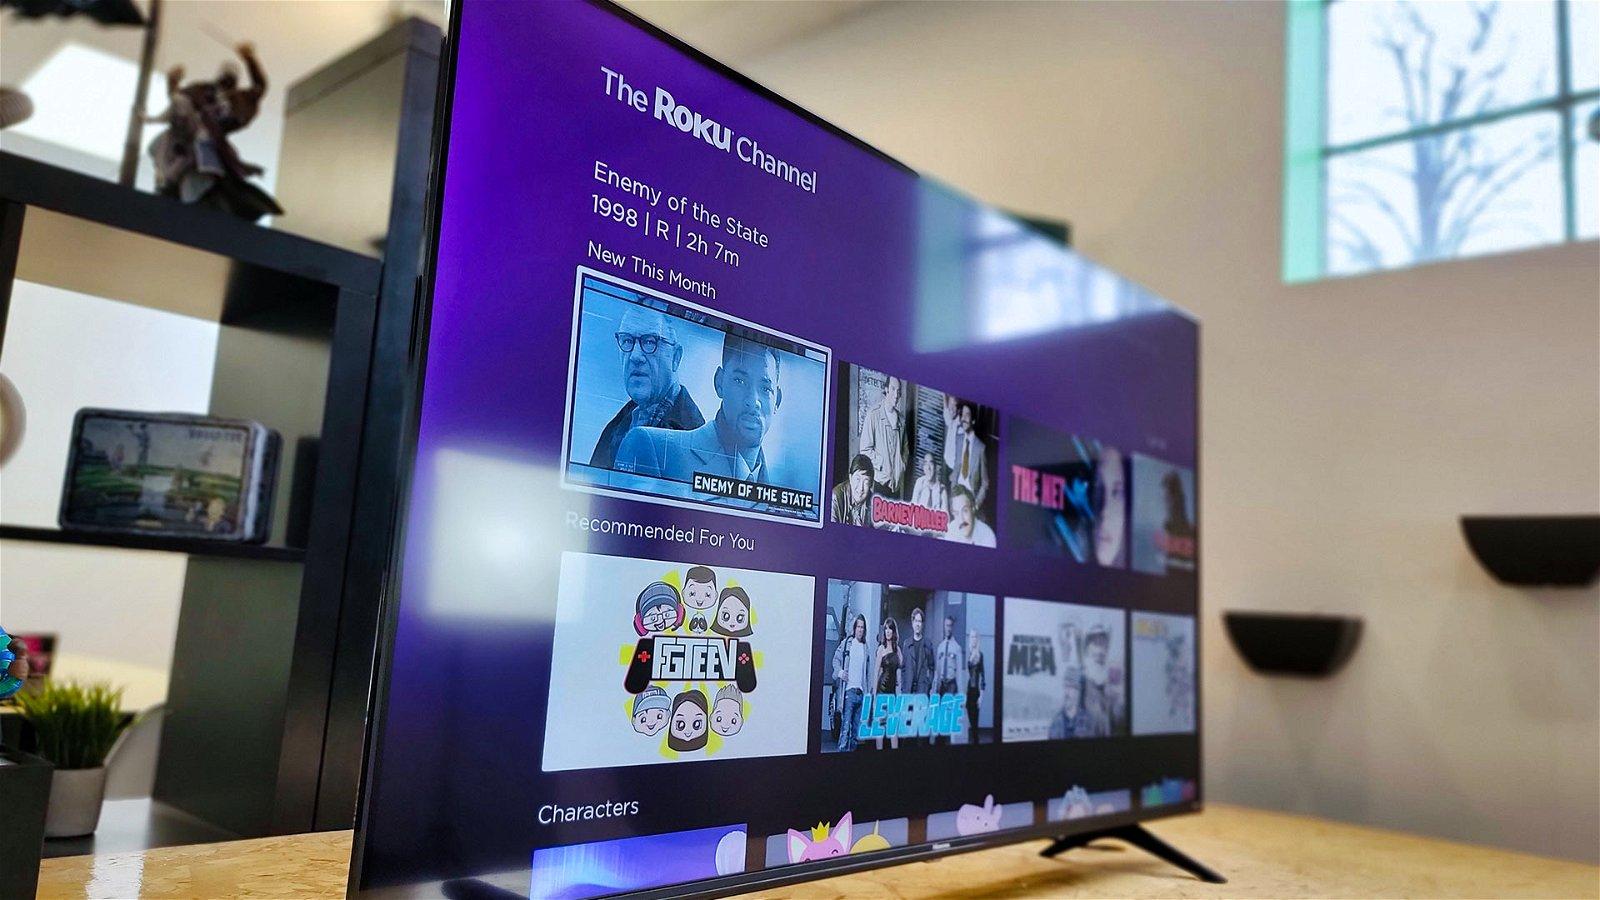 Hisense R6 (2020) 4K Smart TV Review 4